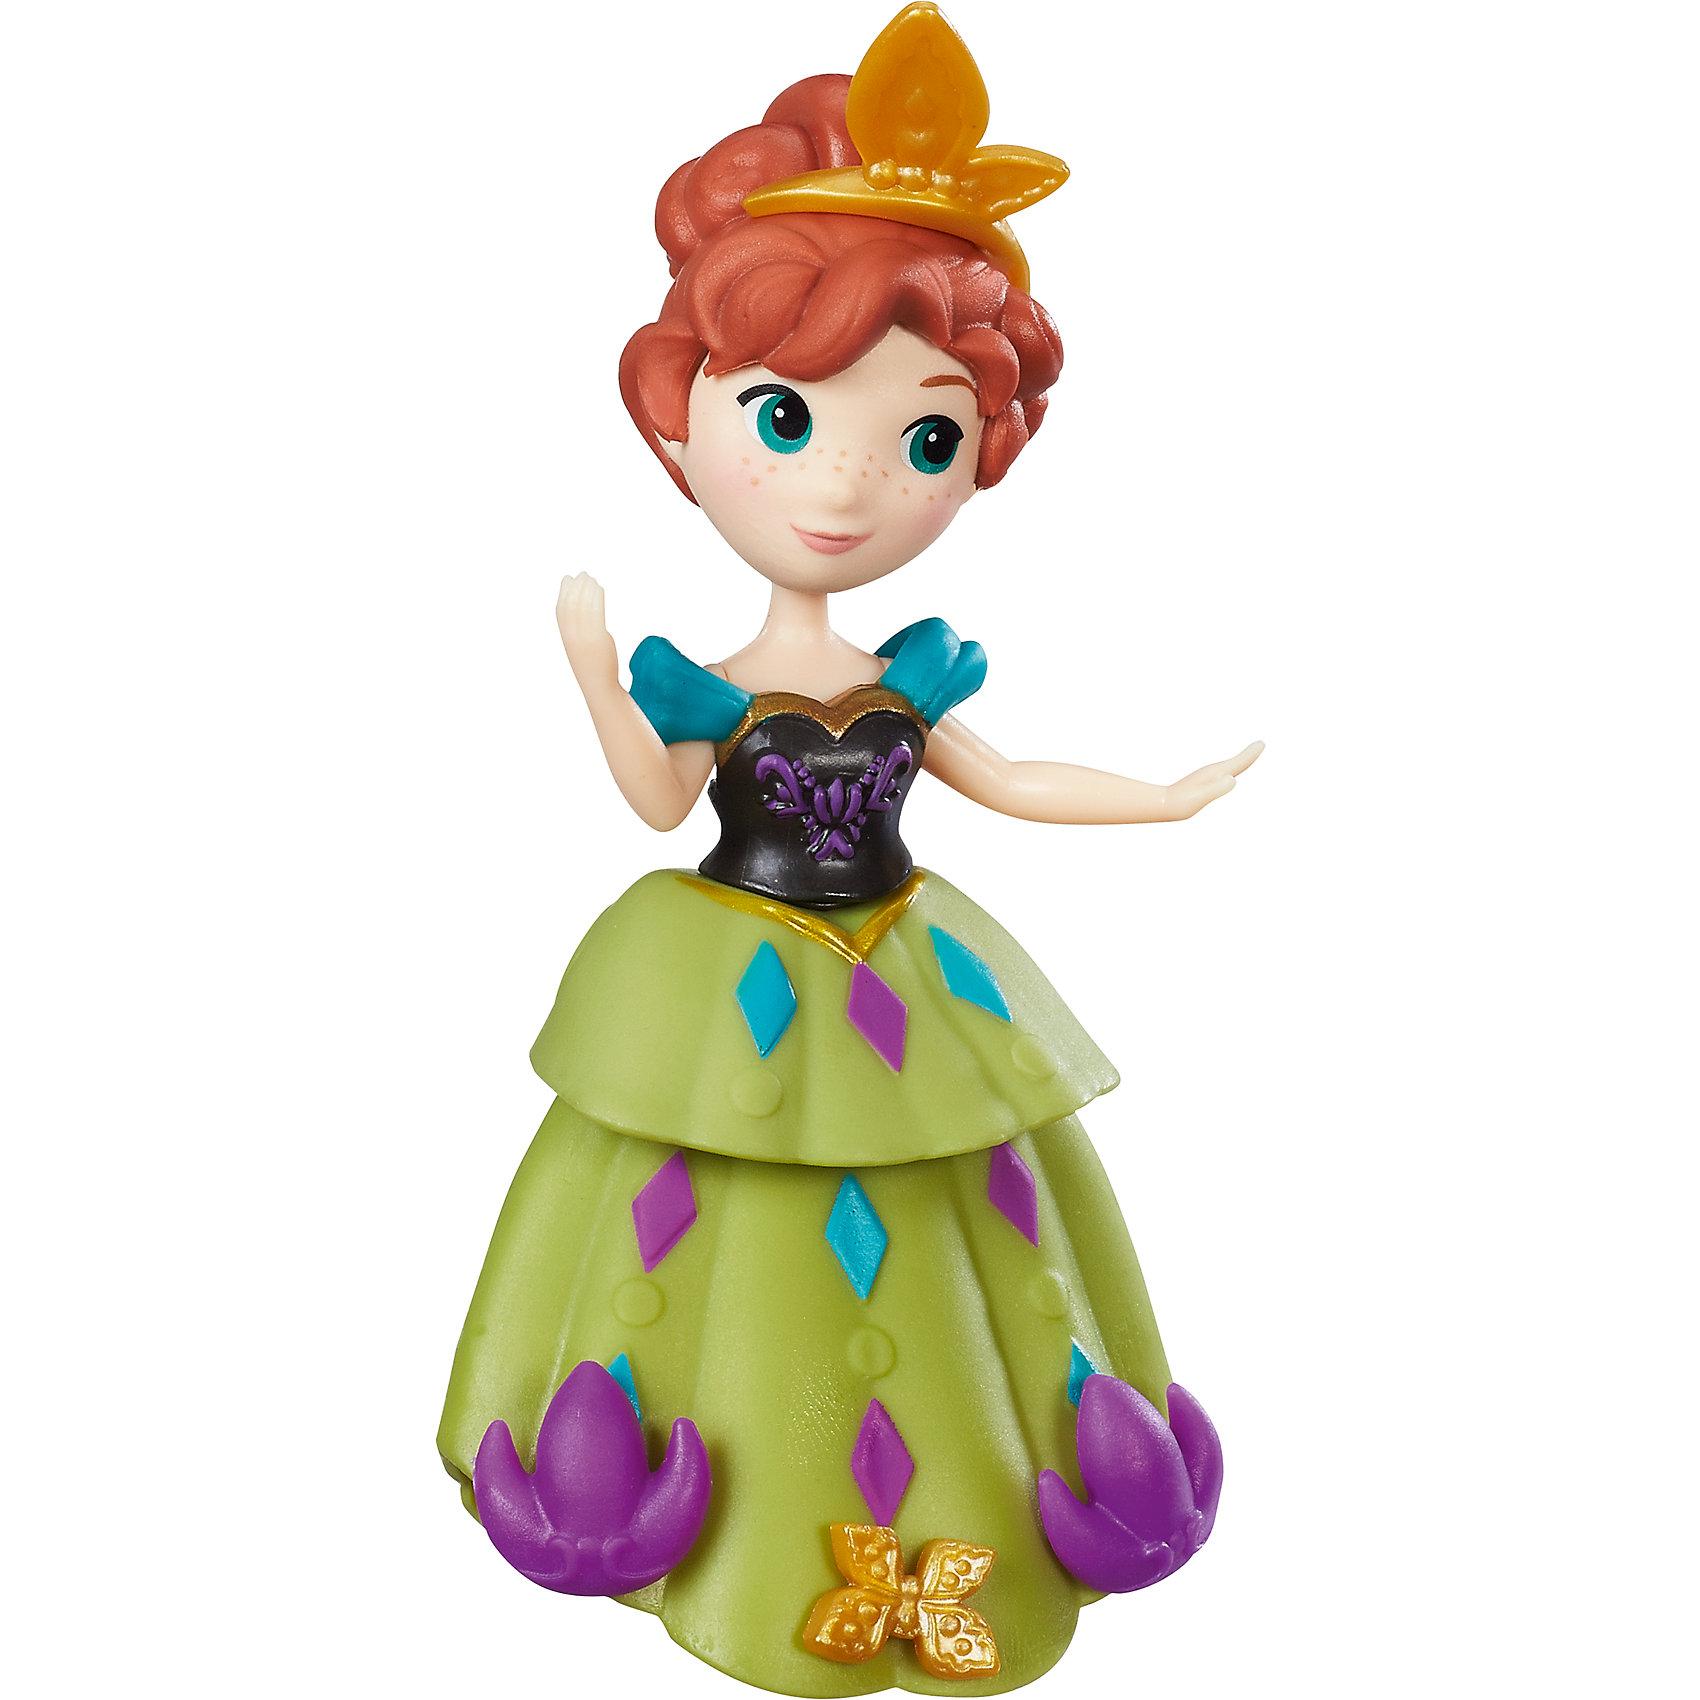 Hasbro Маленькая кукла Холодное сердце, C1096/C1098 hasbro набор кукол холодное сердце анна и кристоф